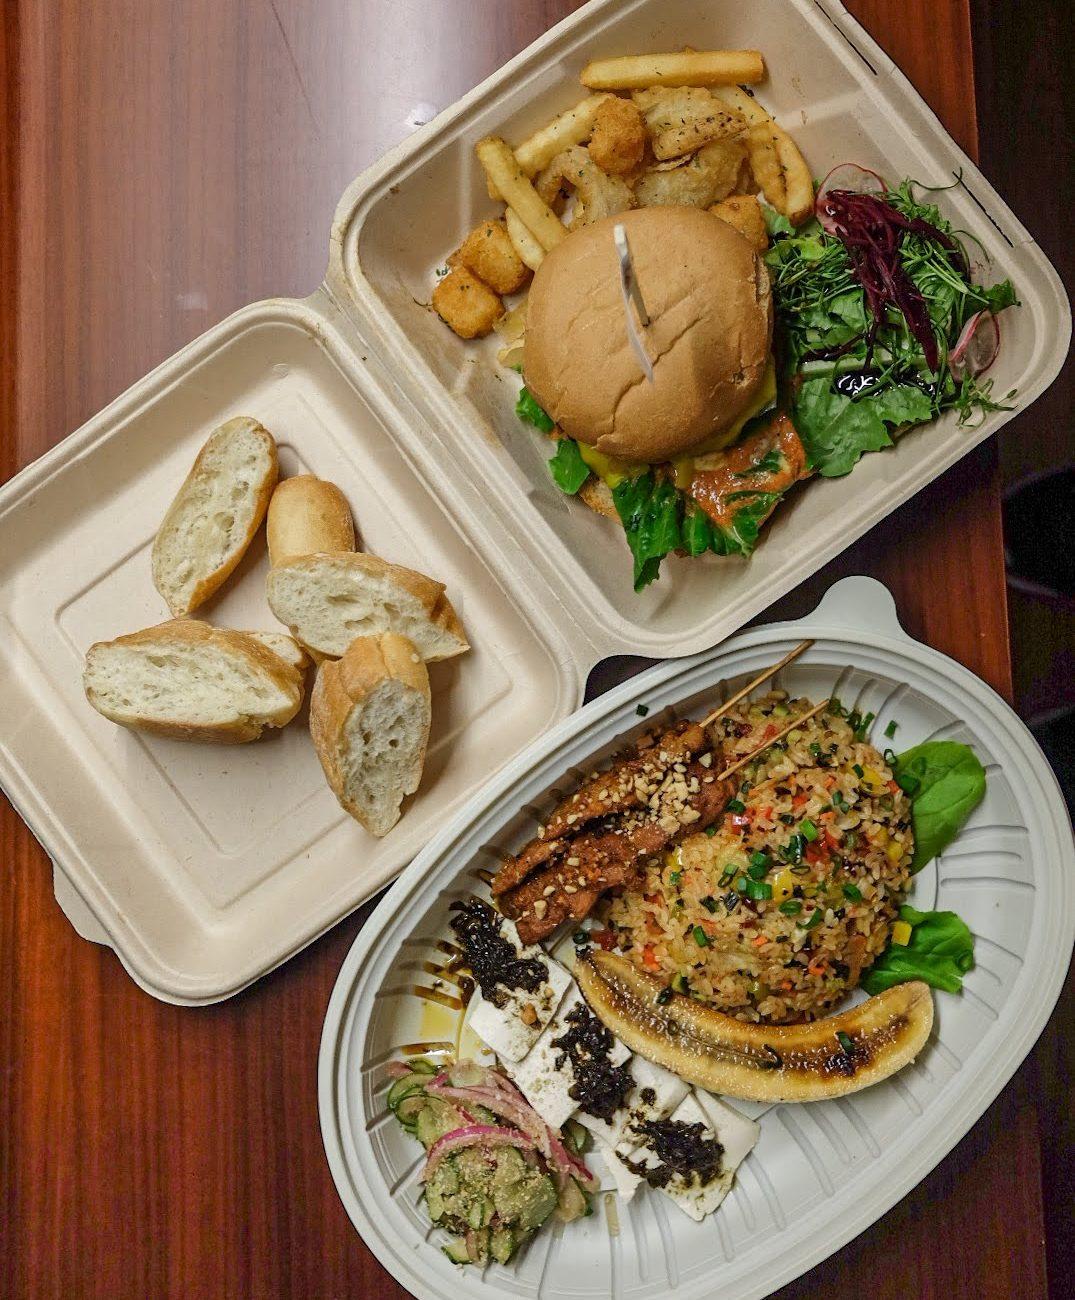 vegan-seoul-guide-monks-butcher-takeaway-meal